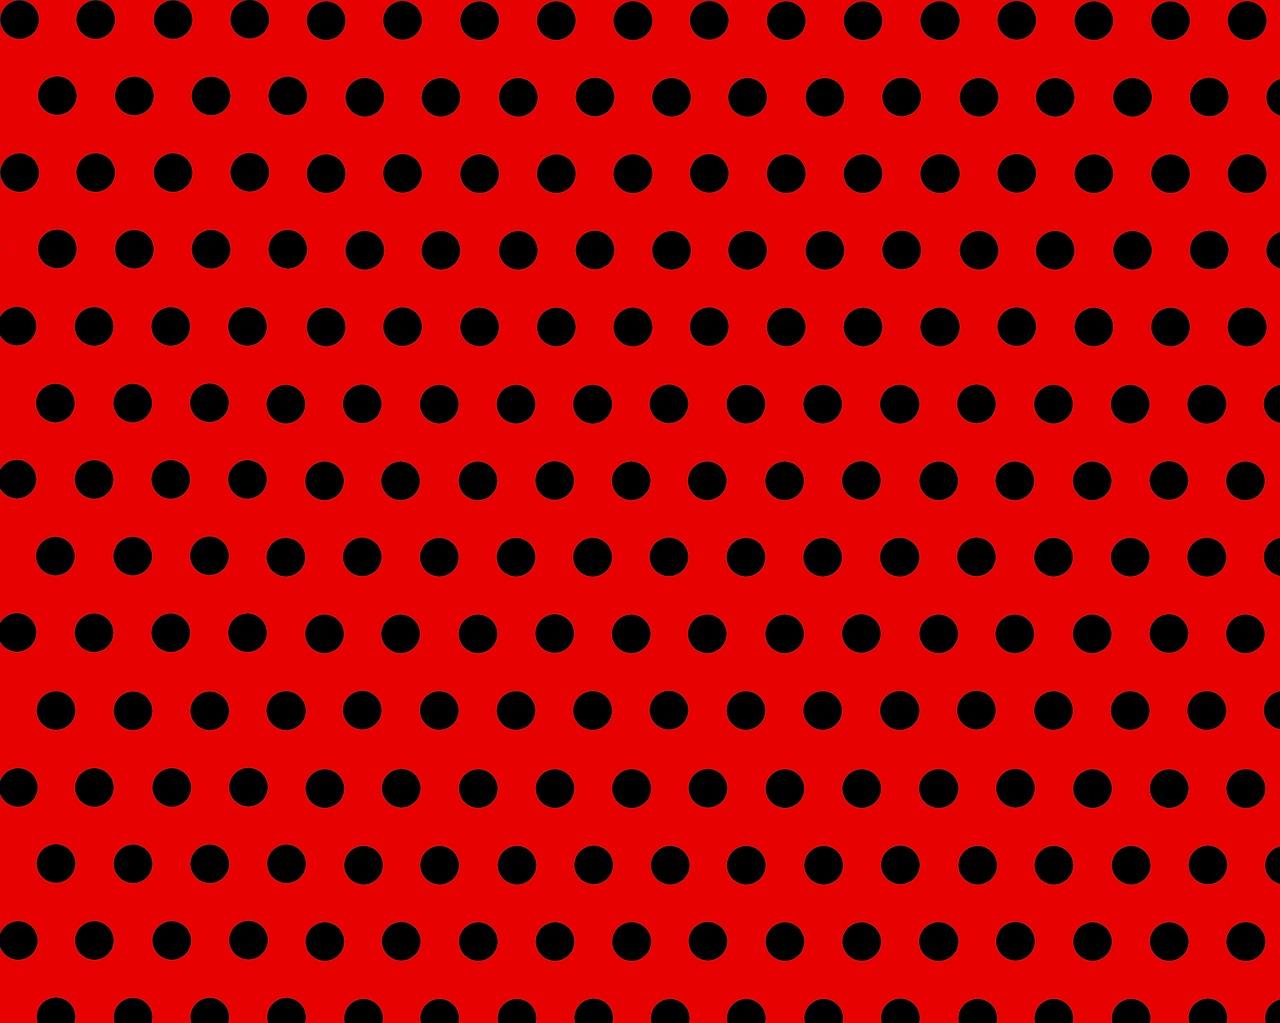 Backgroundredwhite Polka Dotscolorscolorabstract Wallpapersfree